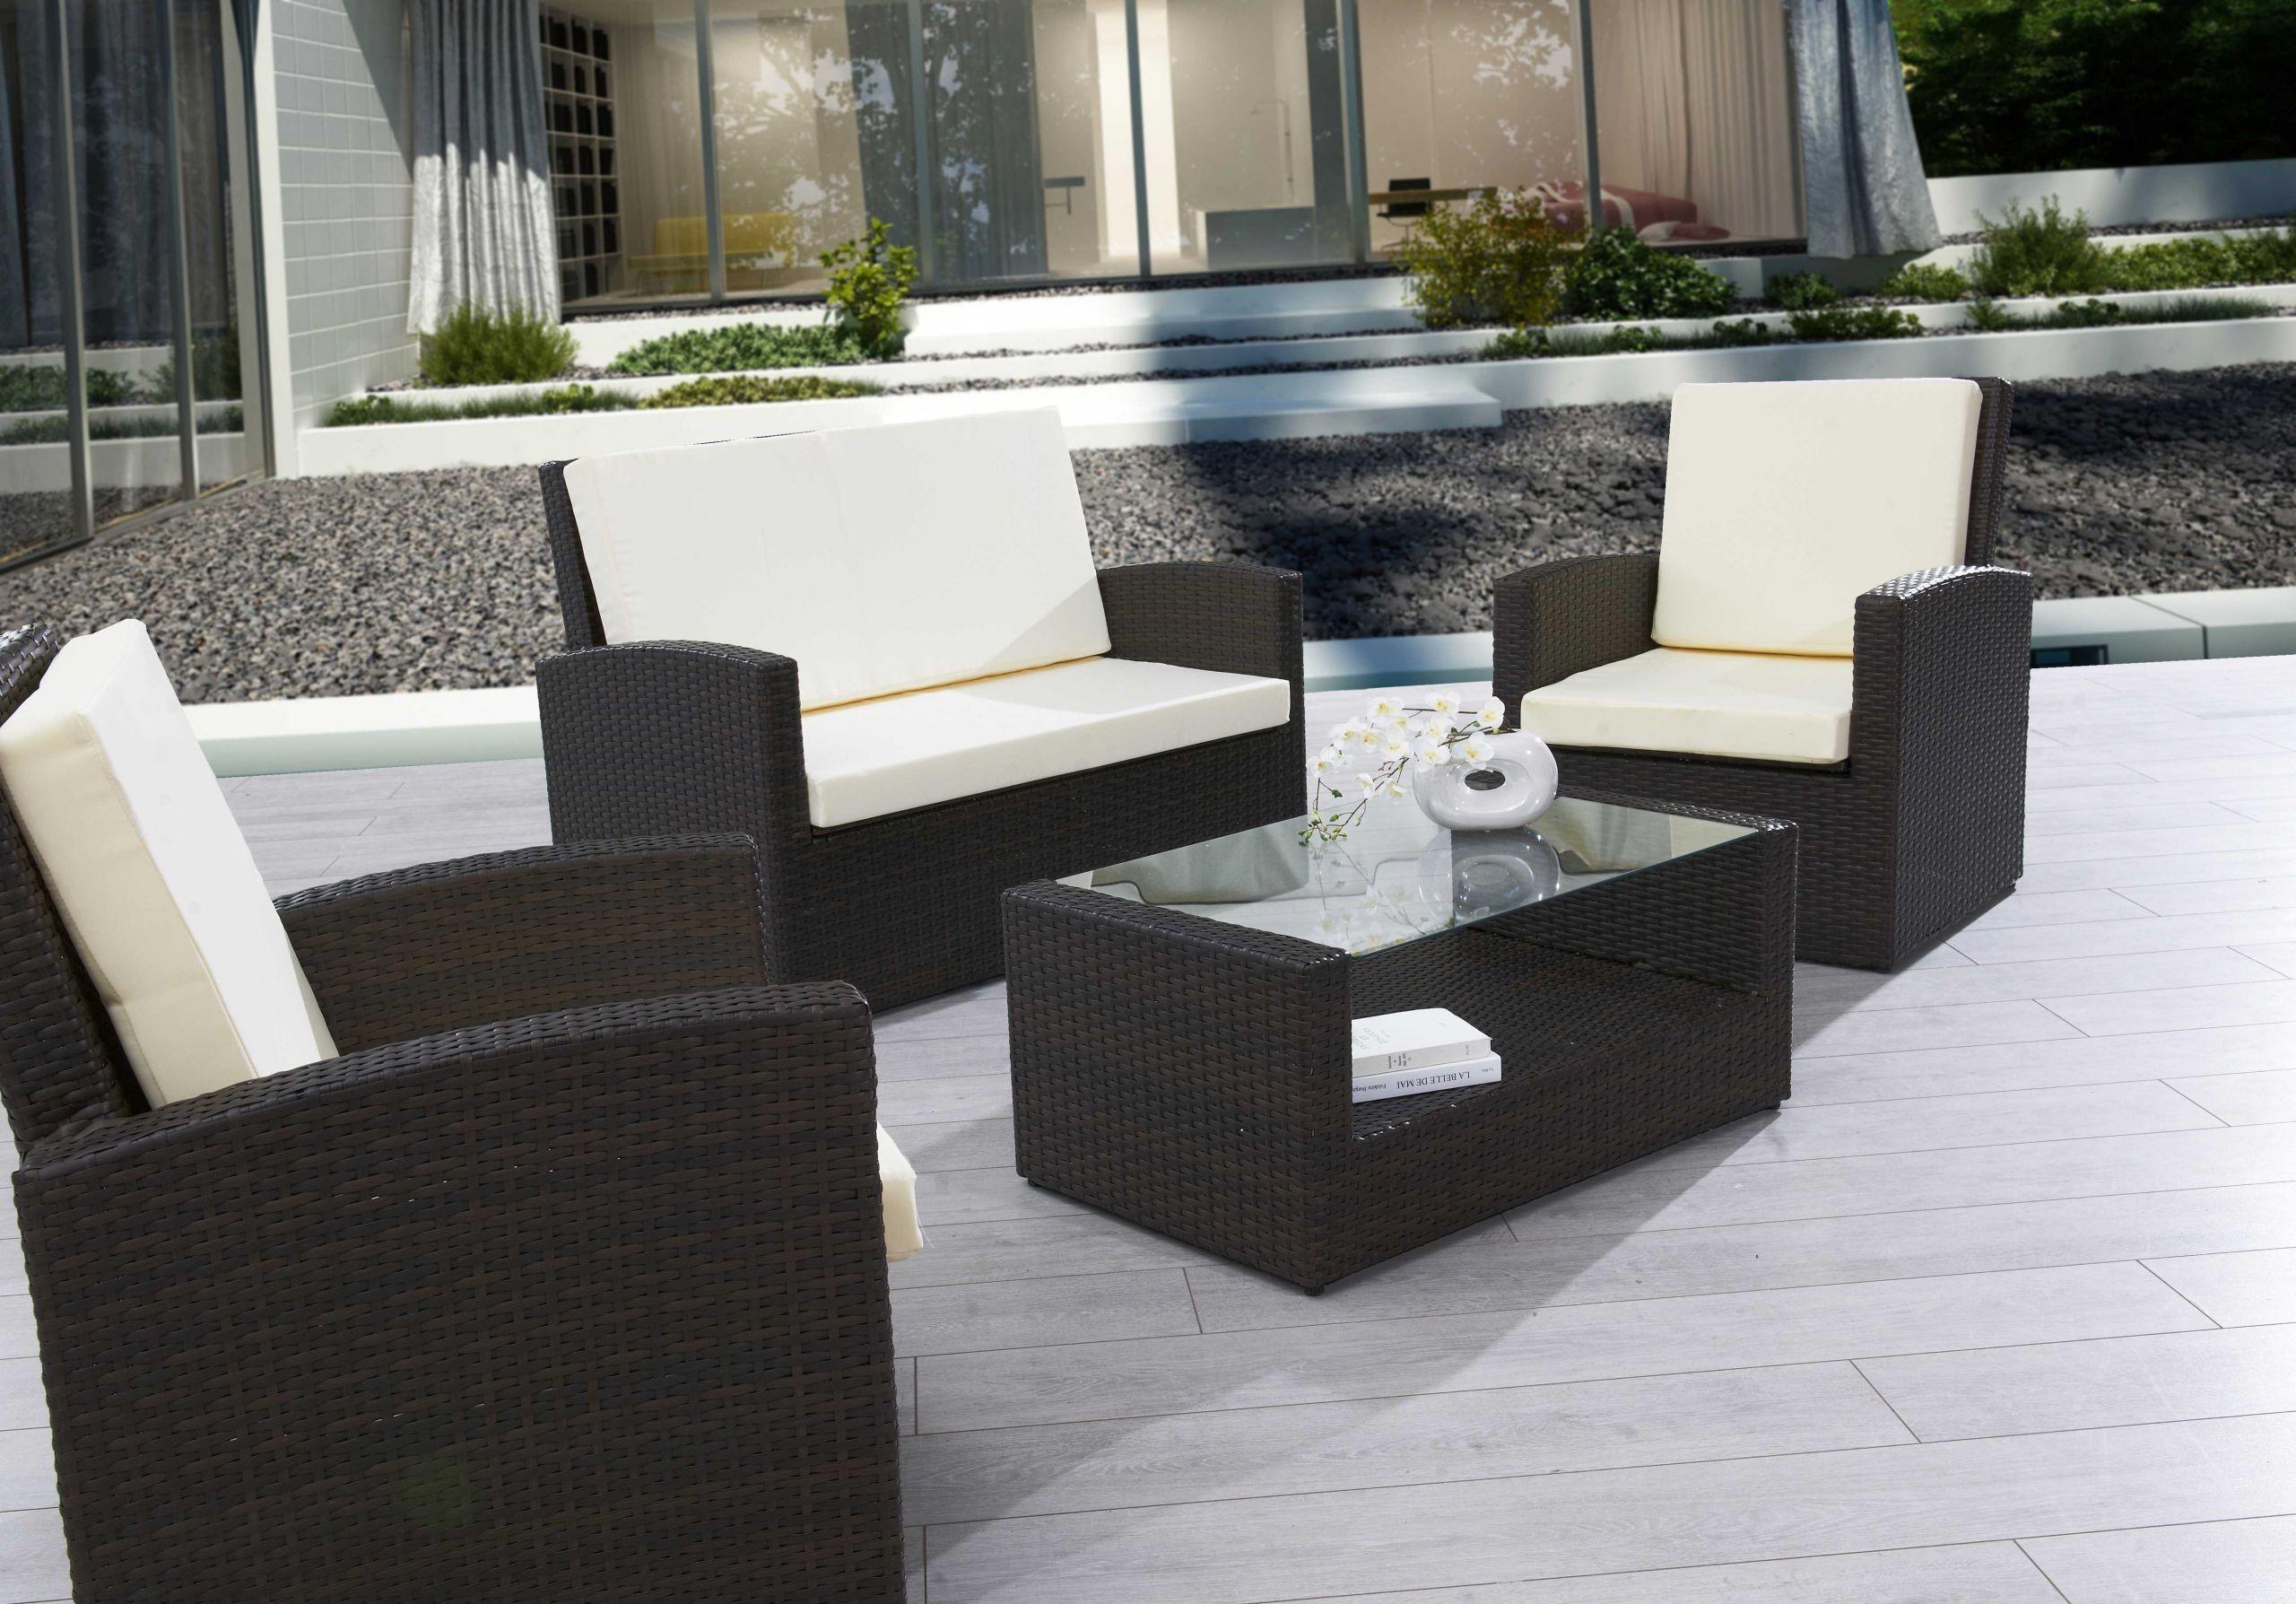 24 Luxe Salon De Jardin Pour Balcon | Salon Jardin dedans Solde Mobilier De Jardin